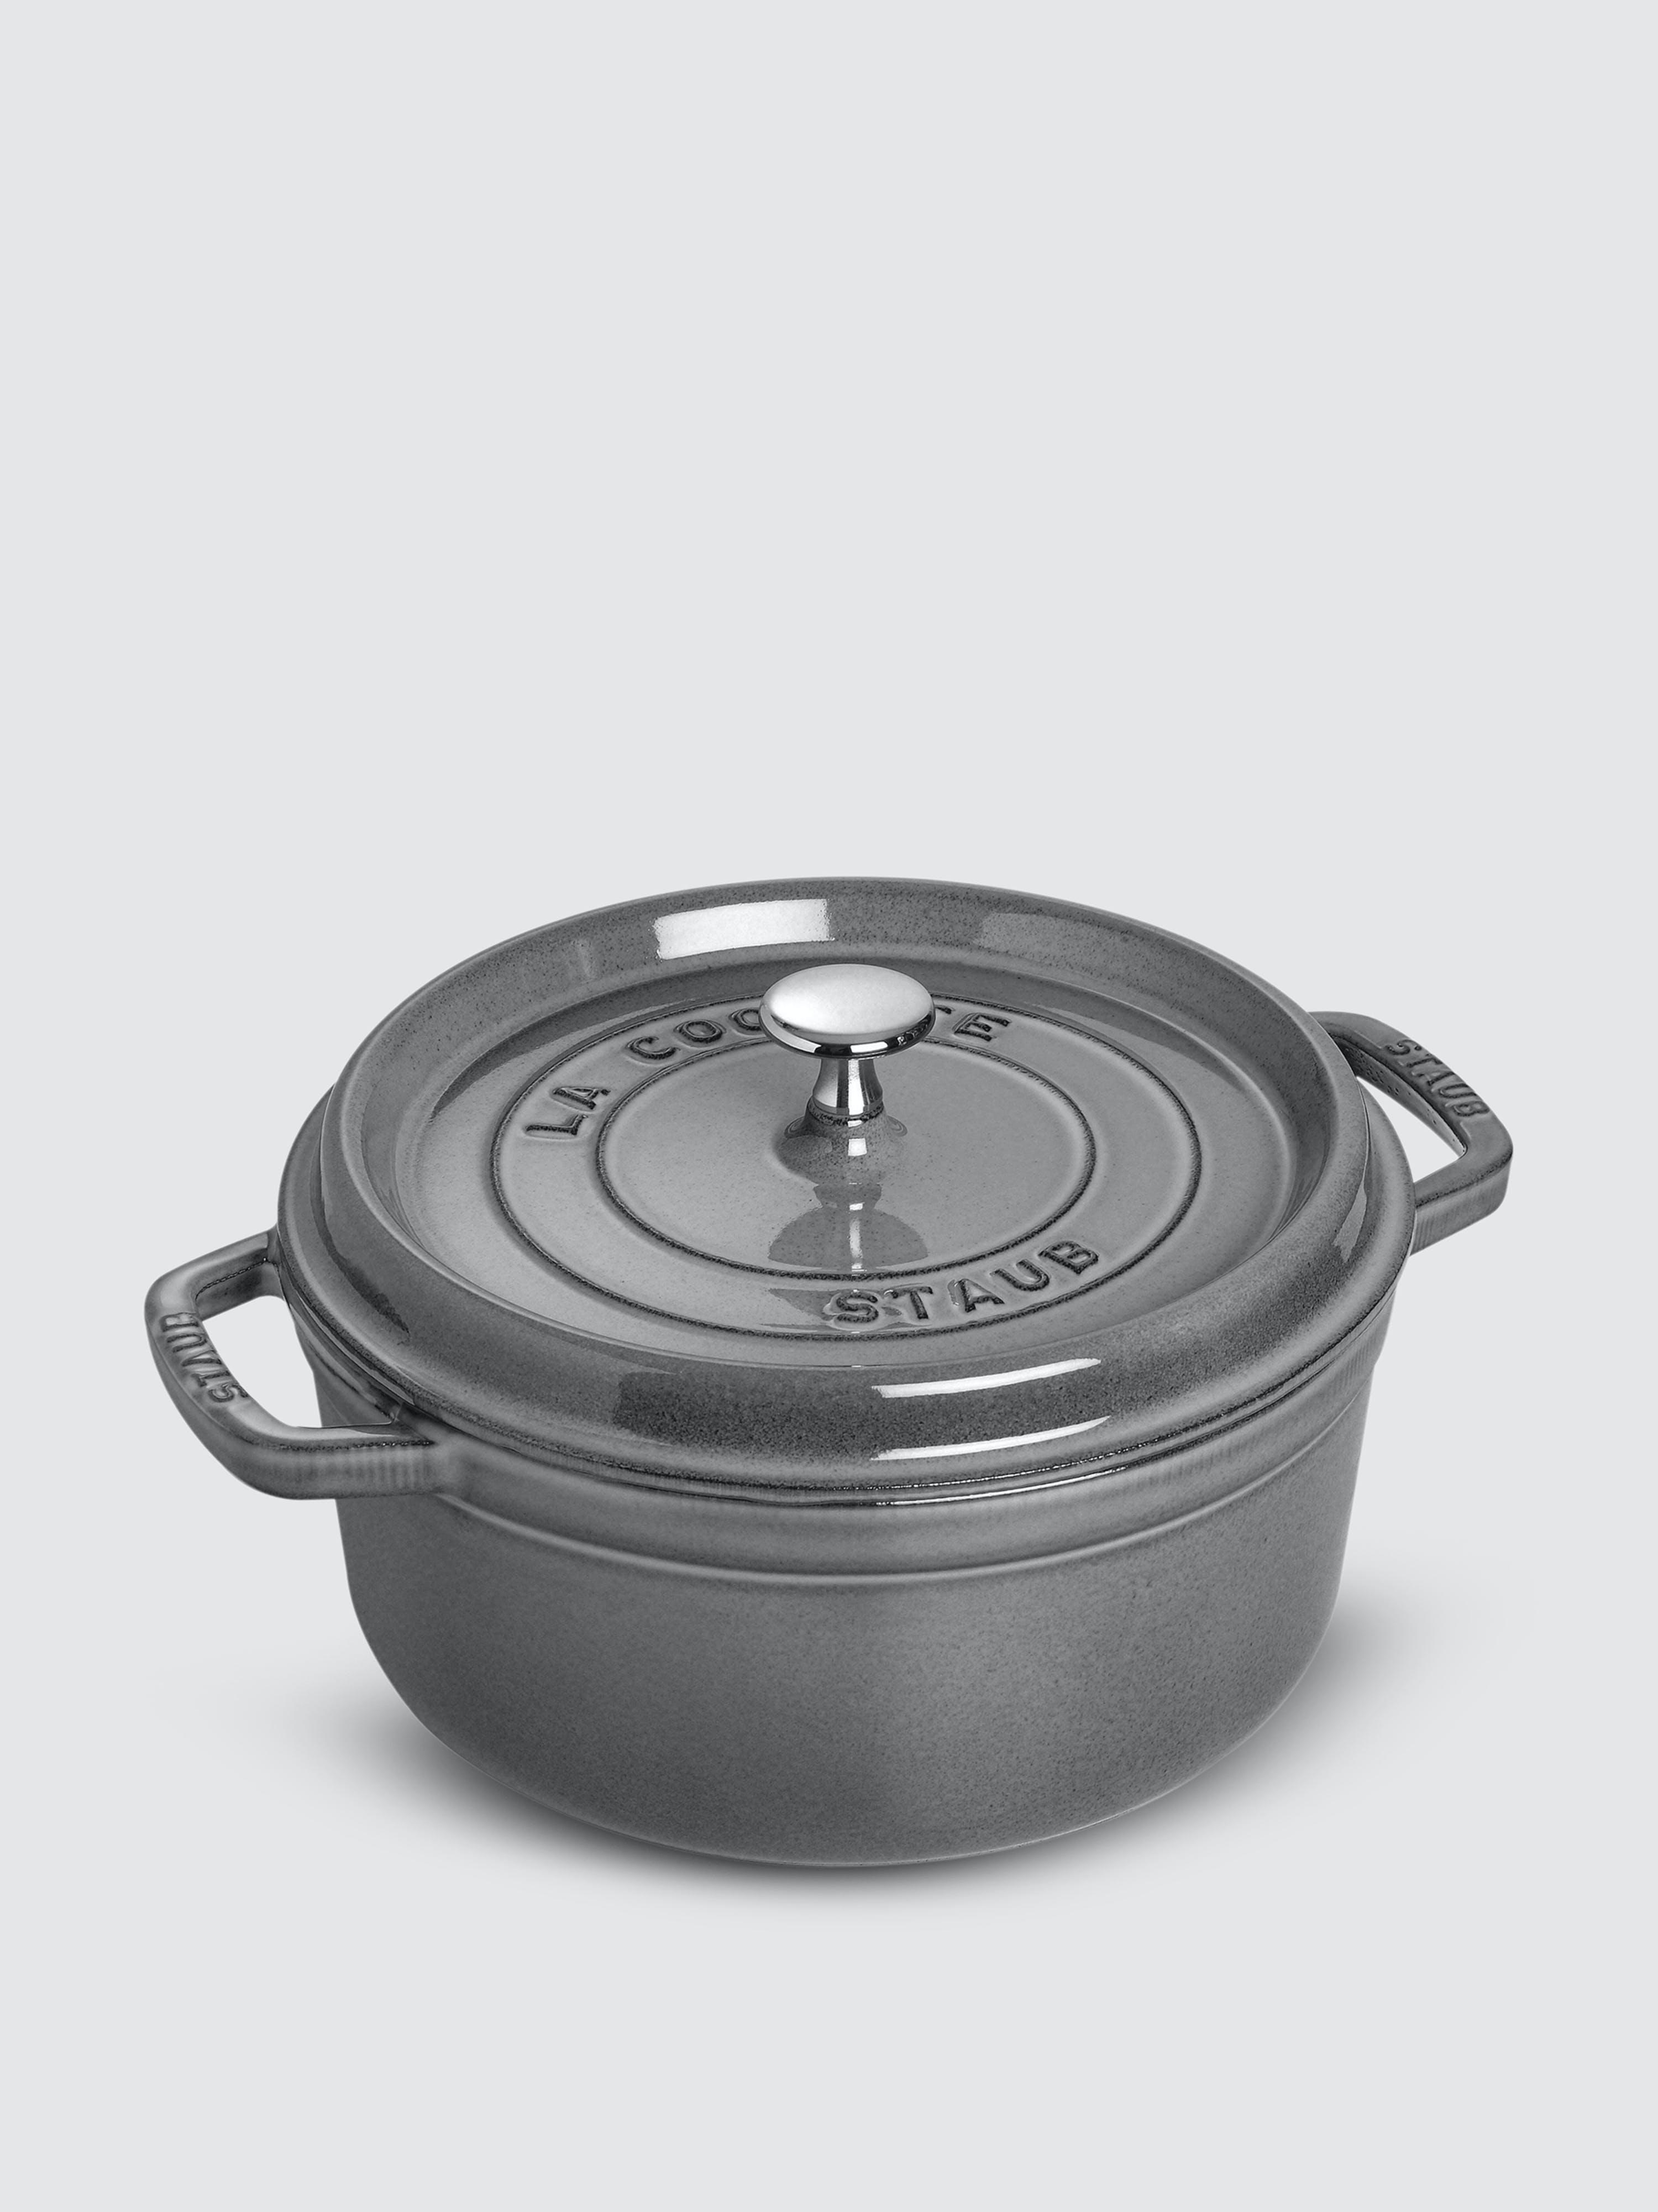 Staub - Verified Partner 4-Qt Round Cocotte  - Grey